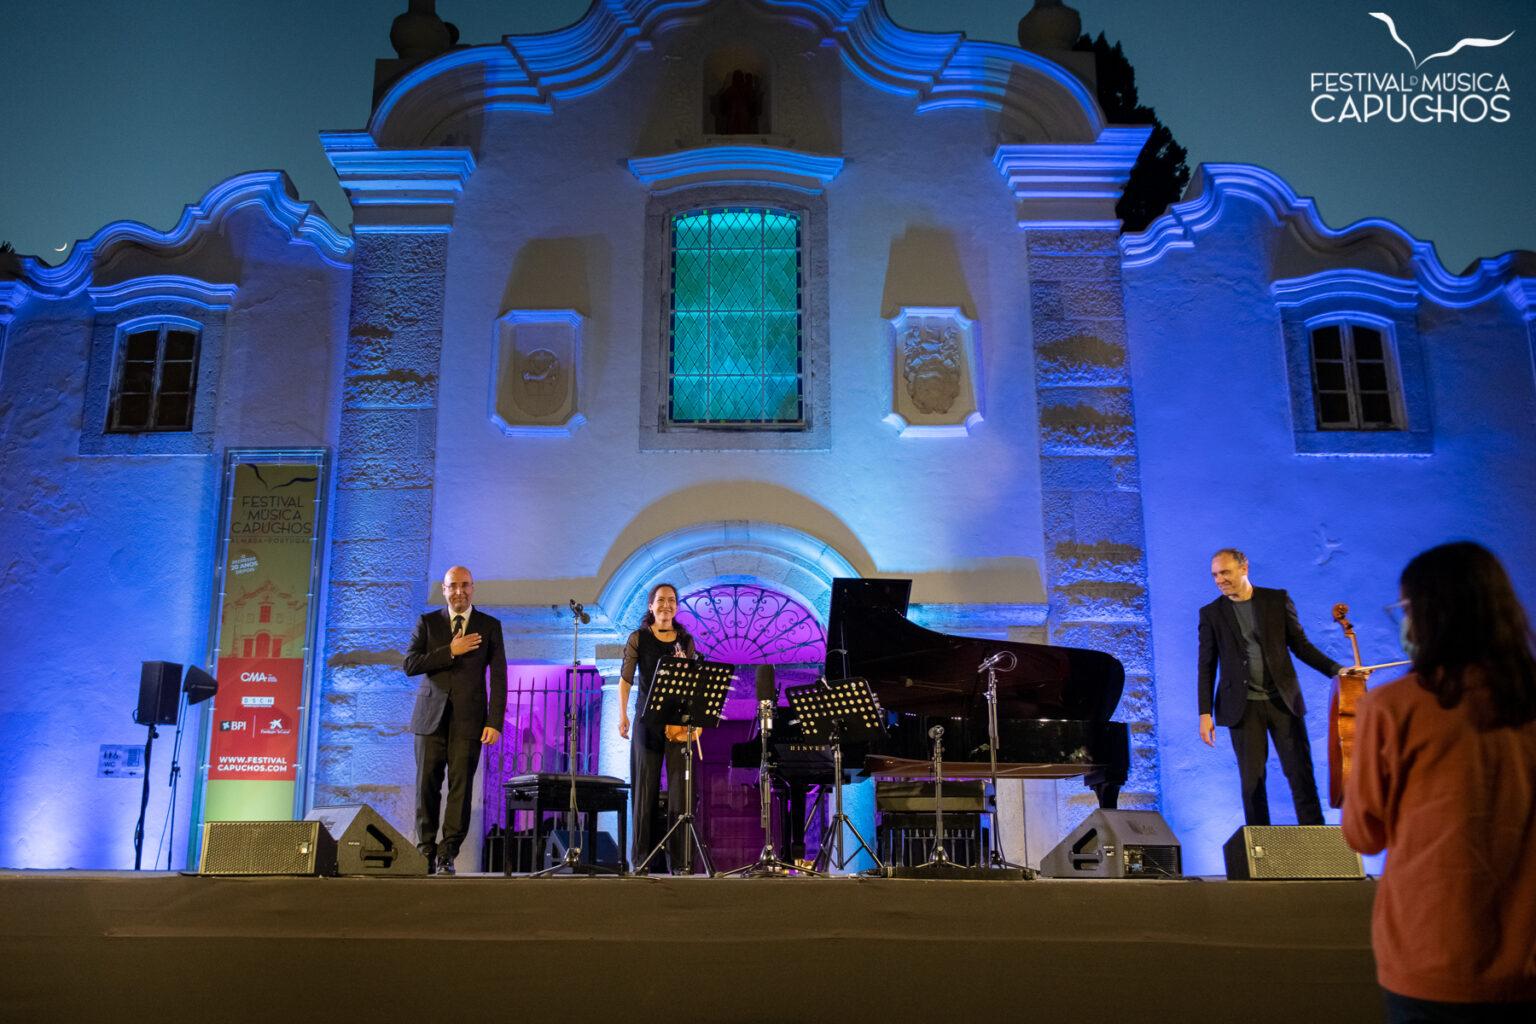 FESTIVAL DOS CAPUCHOS - SCHUBERTÍADA 2 - Viviane Hagner - violino, Adrian Brendel - violoncelo, Filipe Pinto-Ribeiro - piano